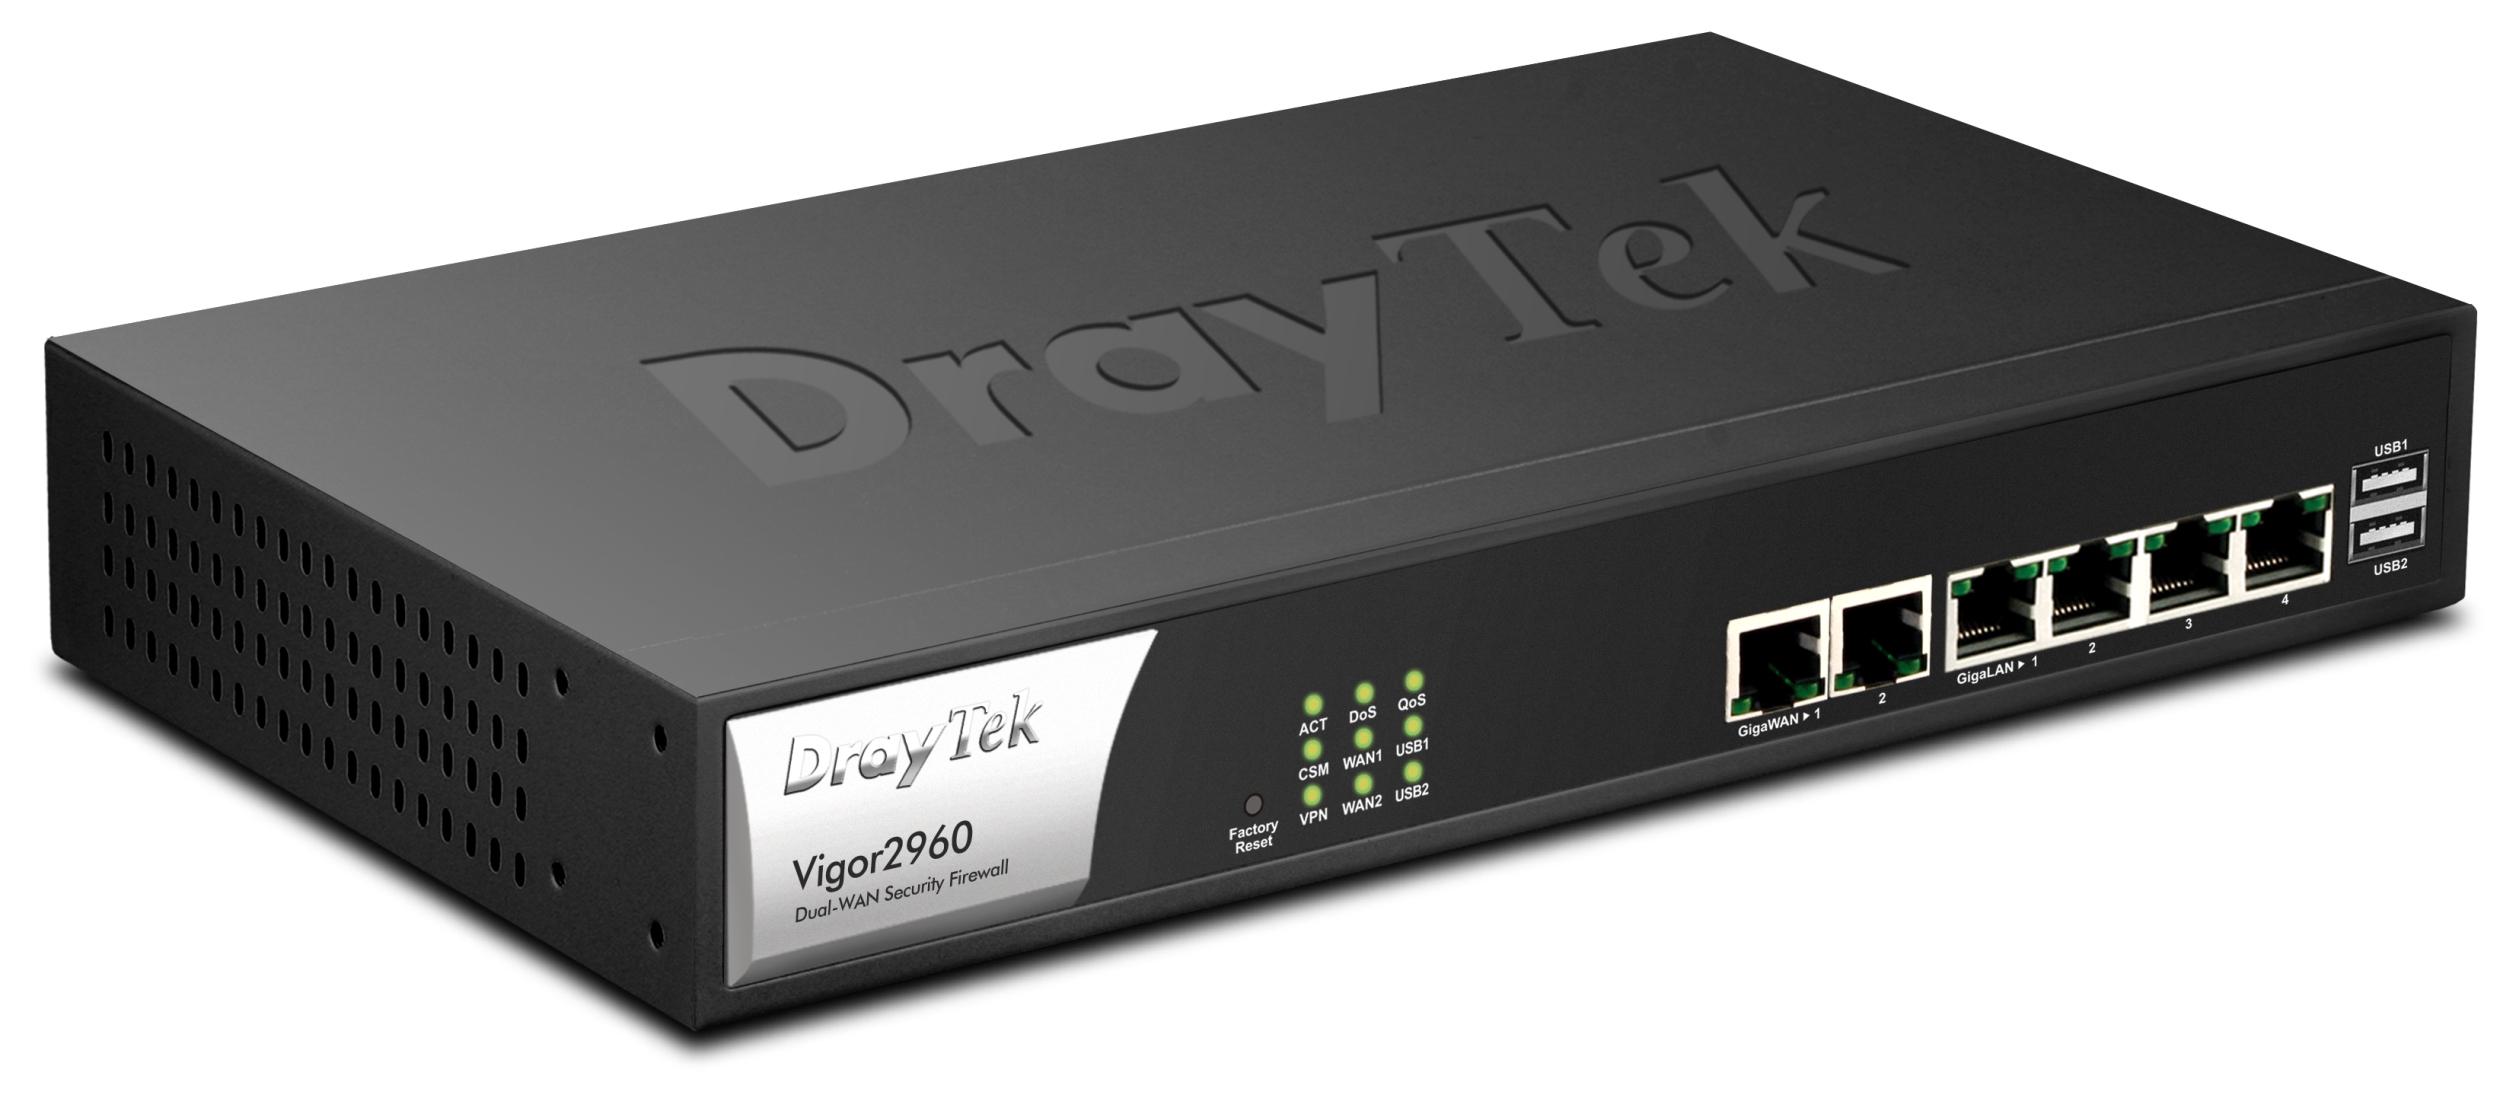 Vigor2960 Dual WAN Security Firewall Series